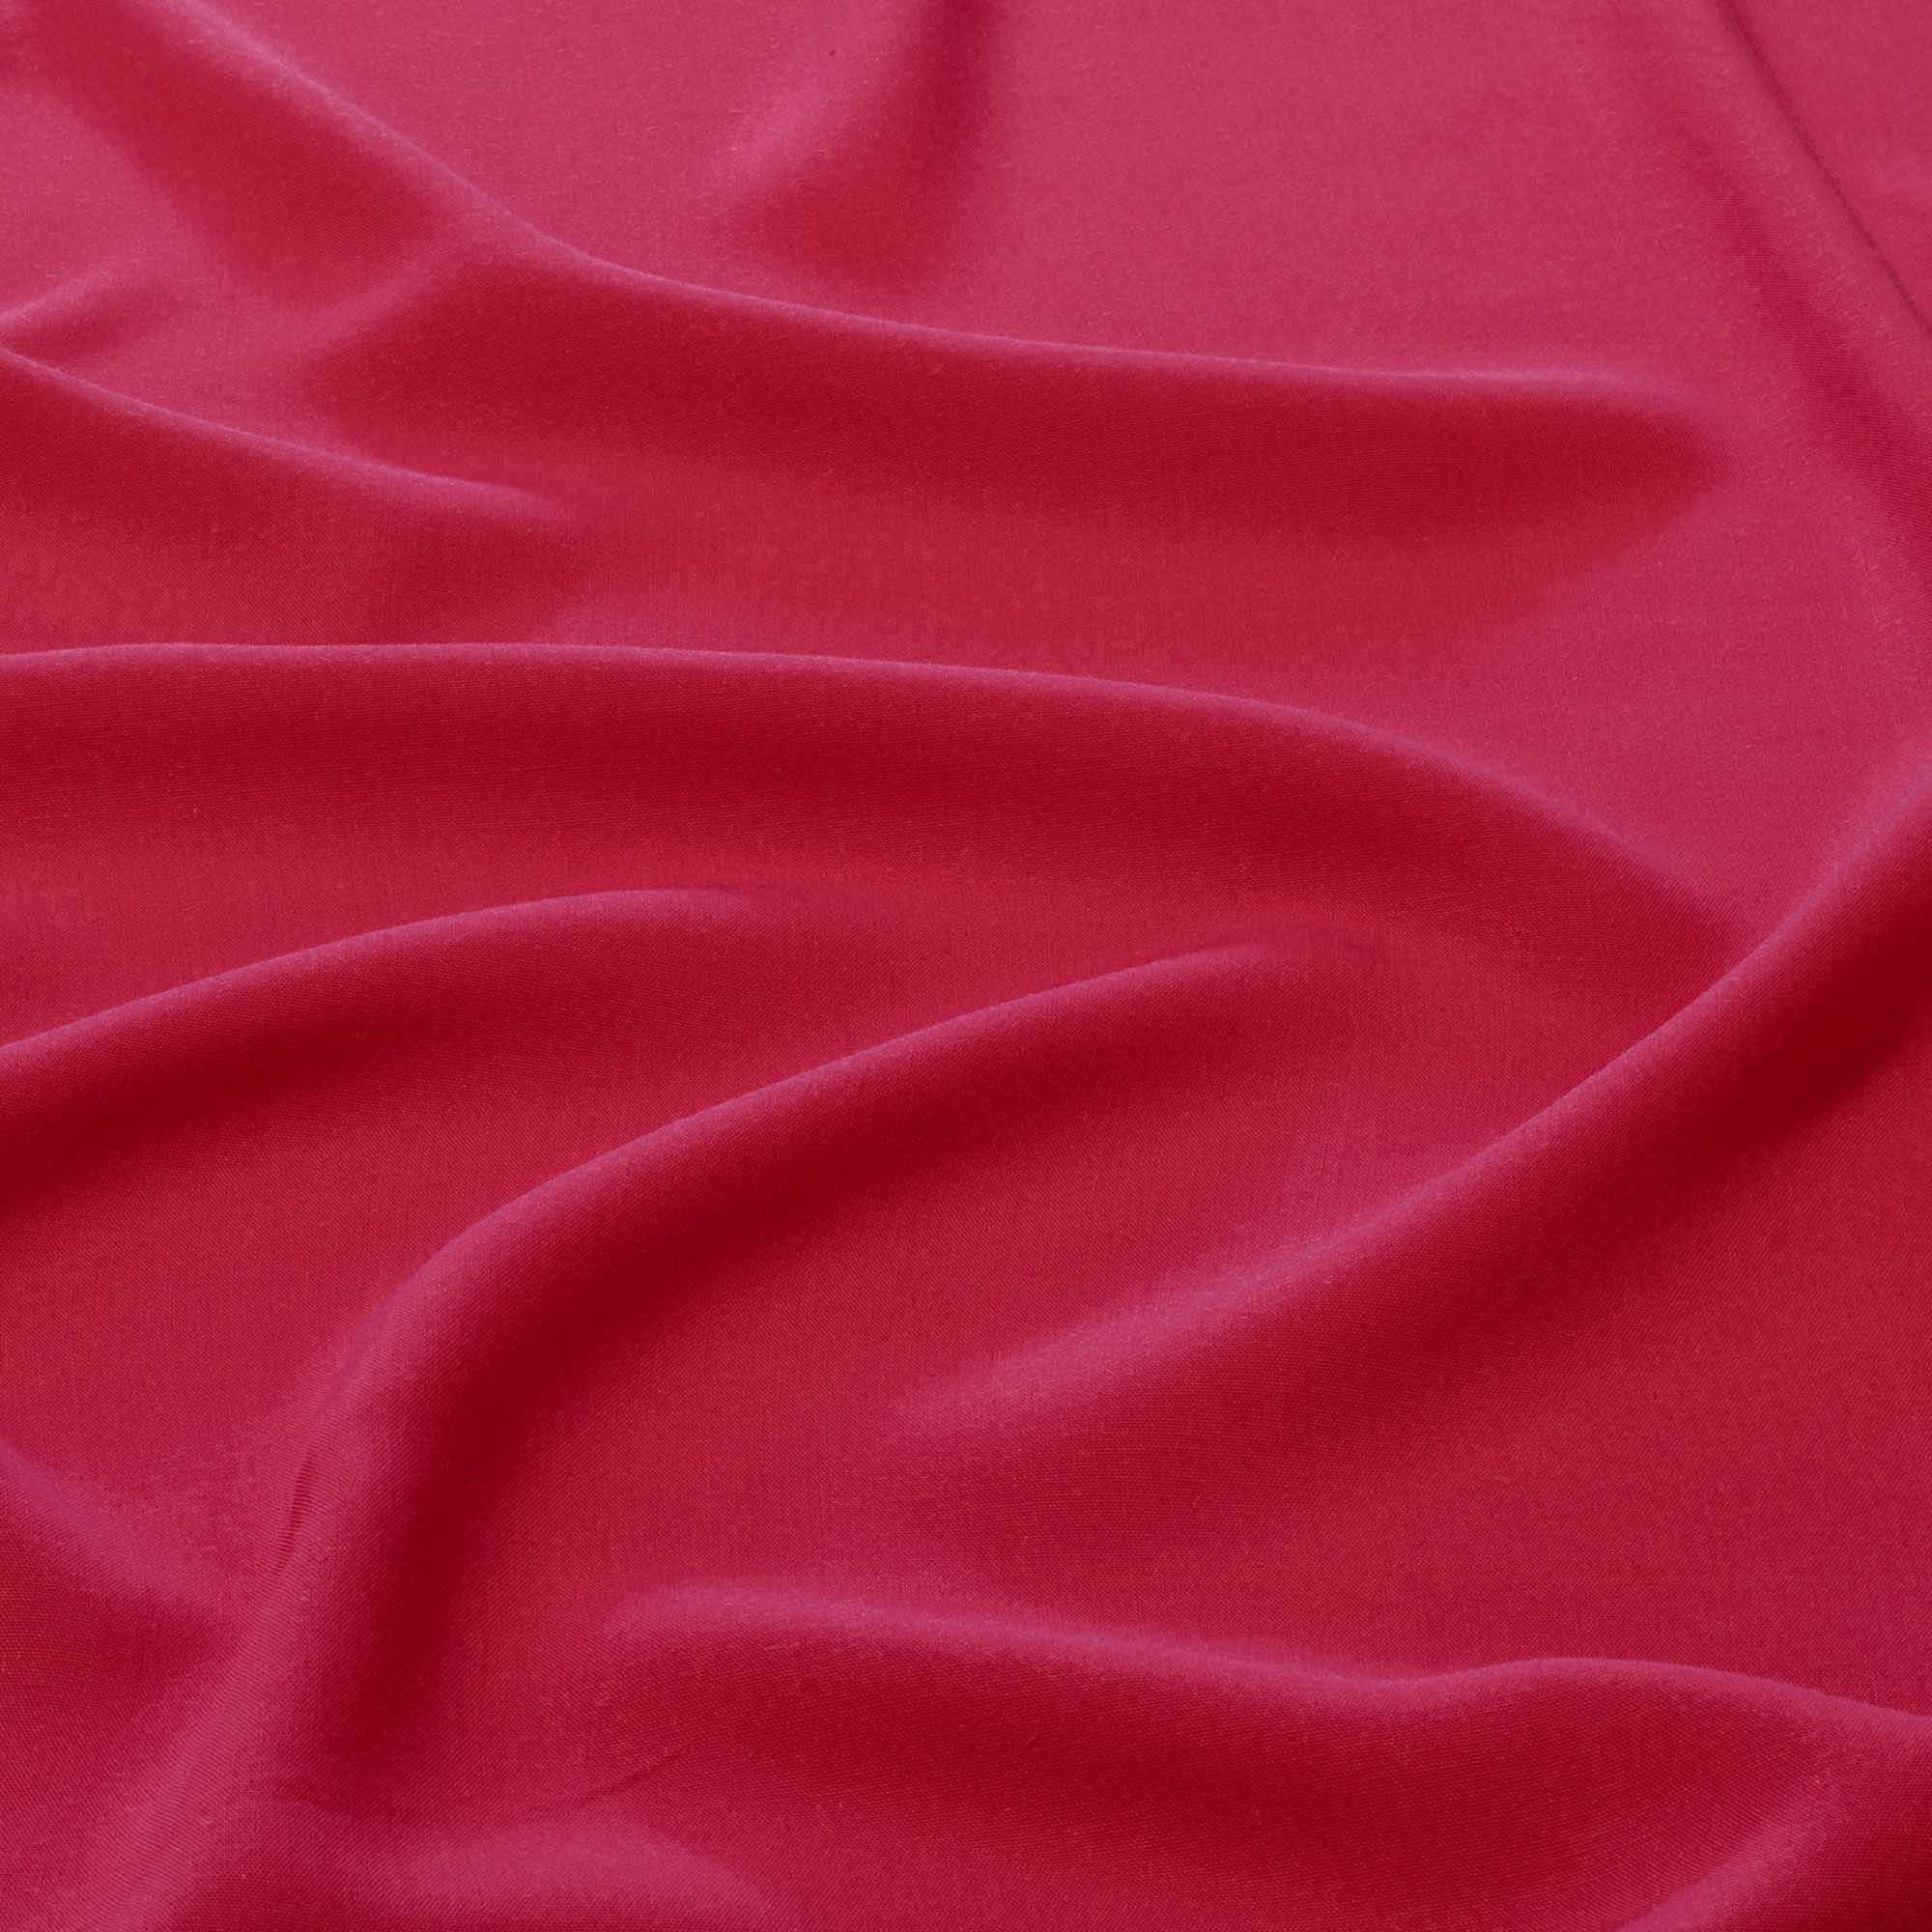 Tecido Viscose Rosa Pink 100% Viscose 1,40 m Largura